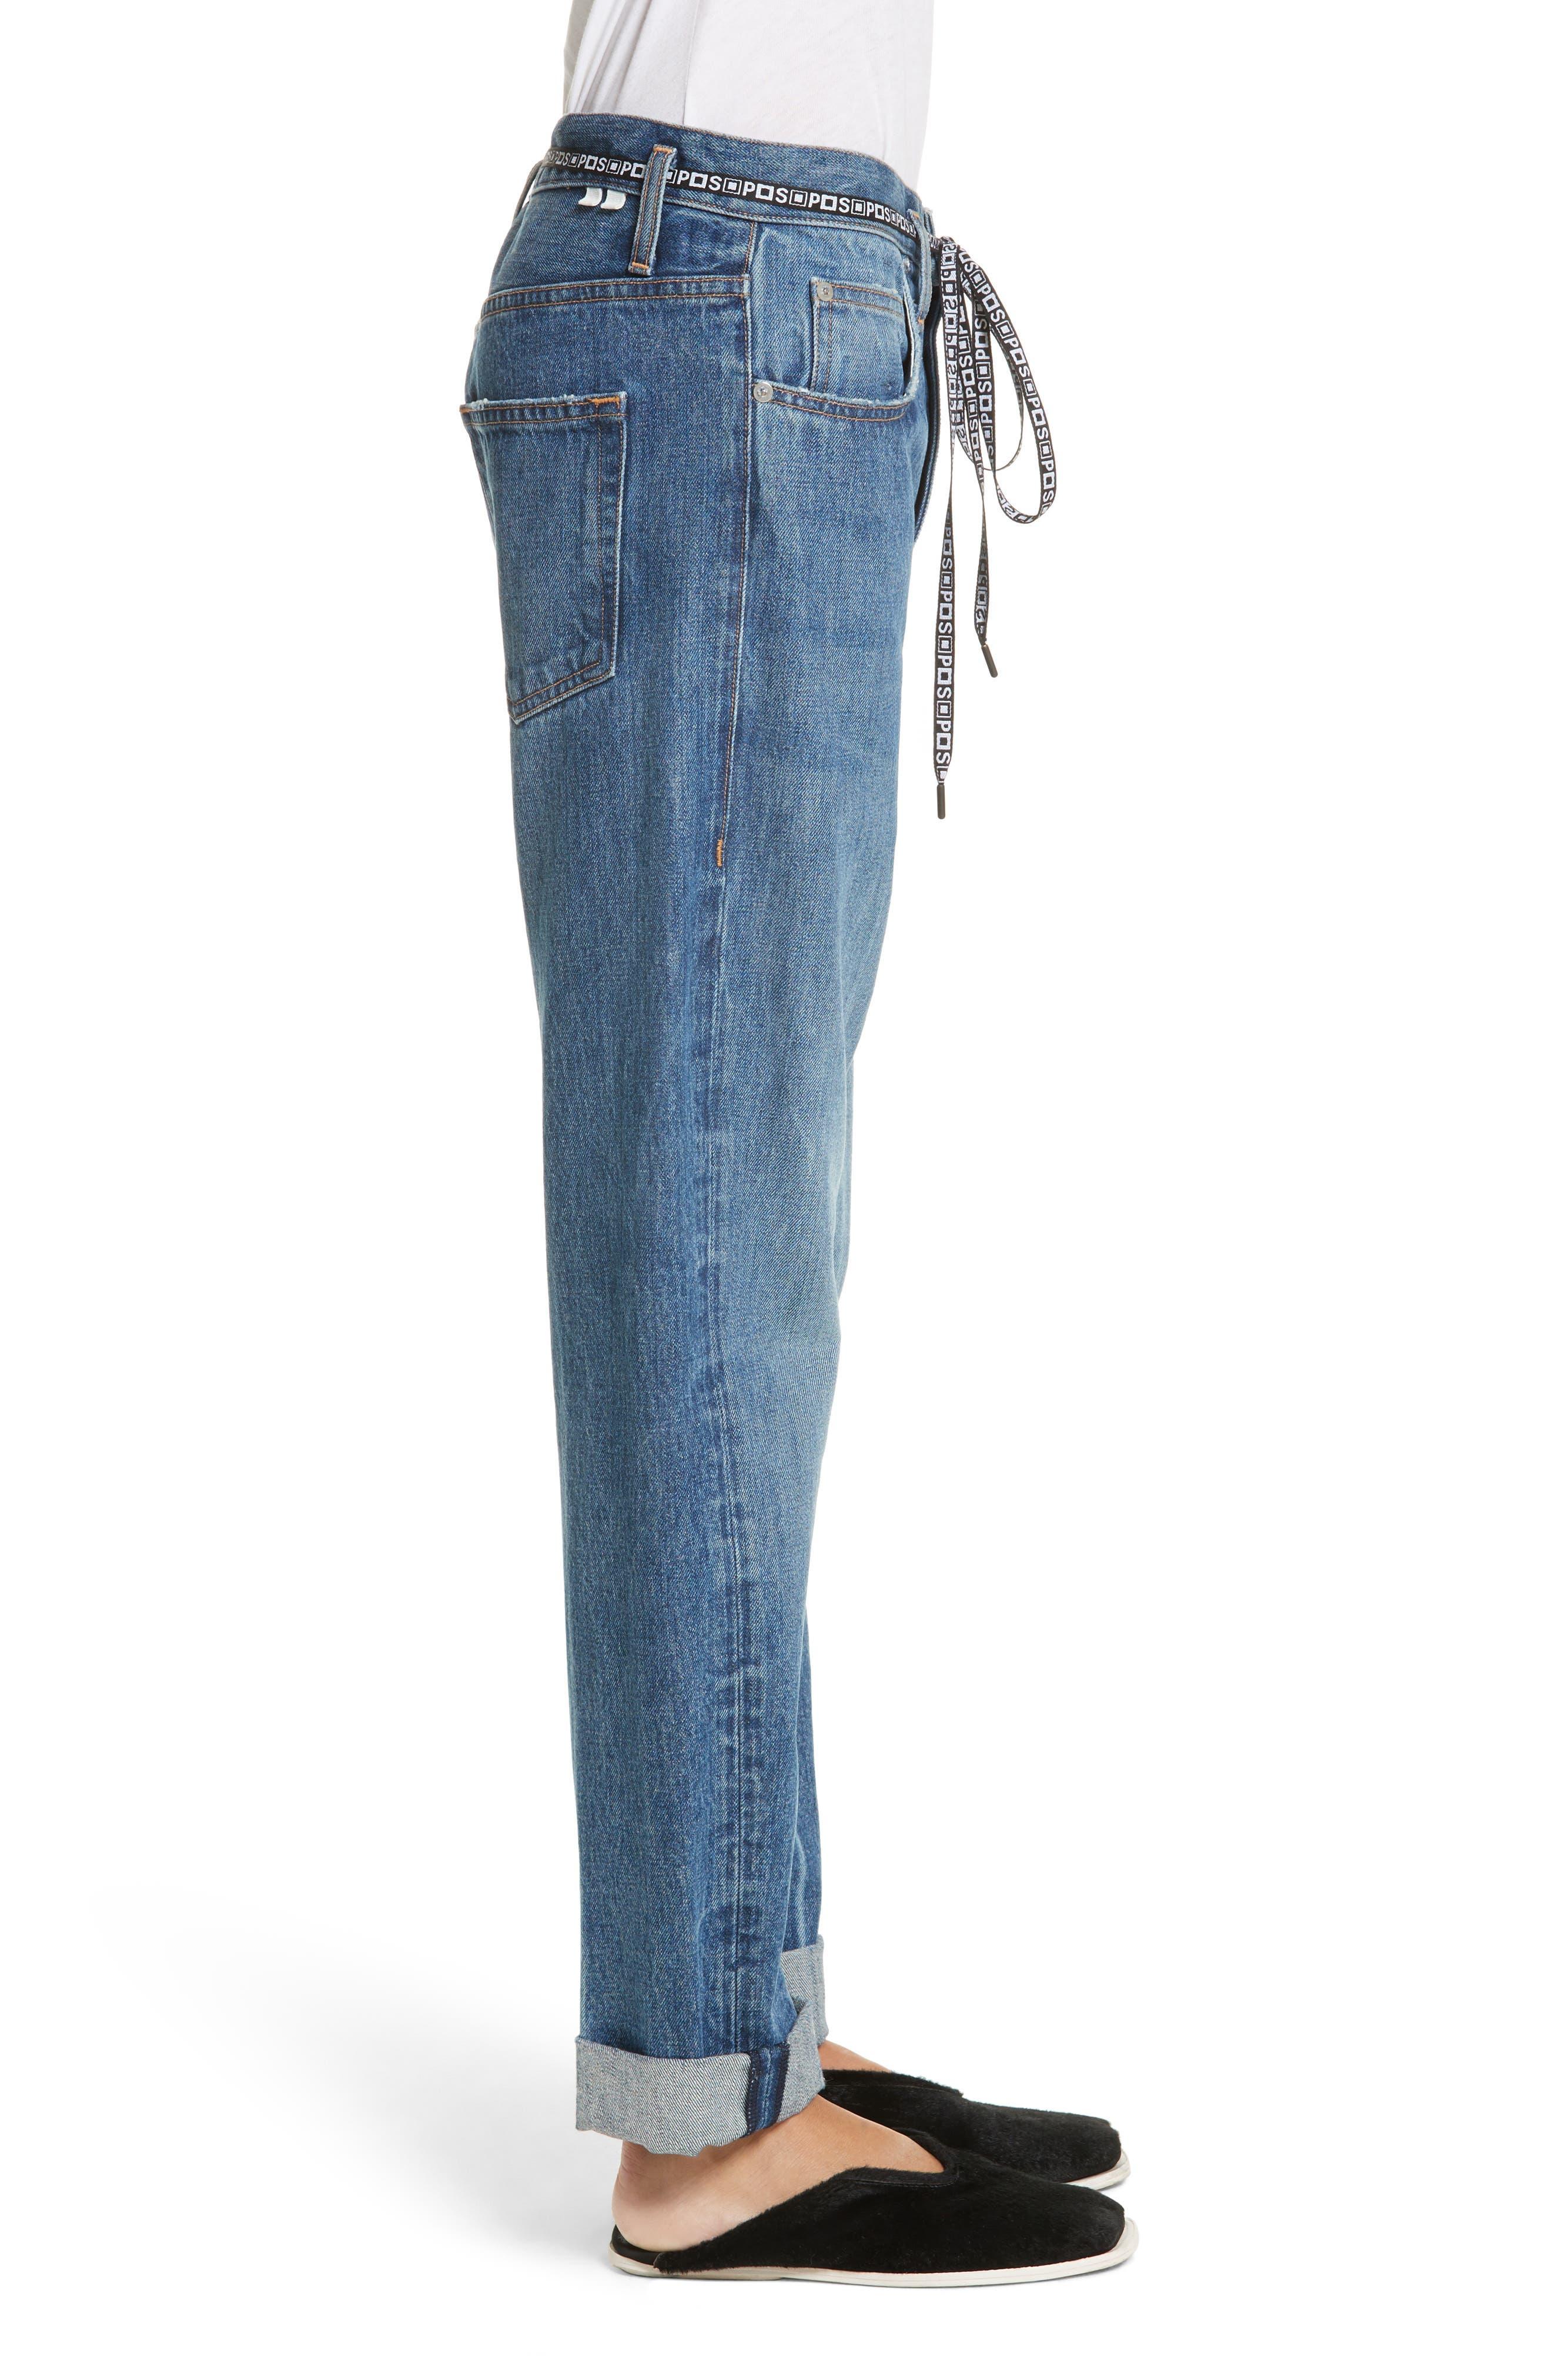 PSWL Cuffed Straight Leg Jeans,                             Alternate thumbnail 4, color,                             Medium Blue